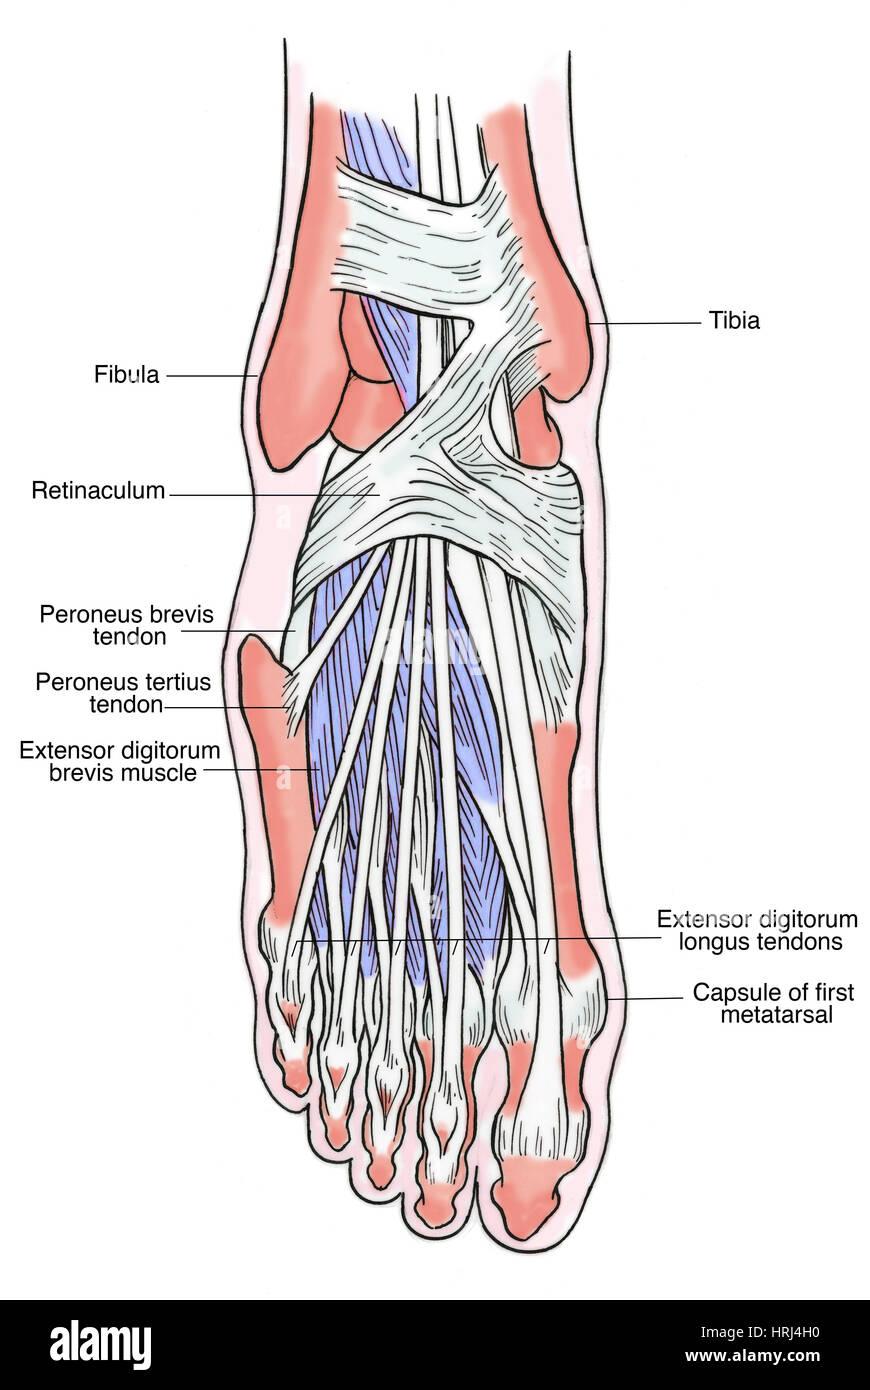 Extensor Digitorum Brevis Muscle Stock Photos Extensor Digitorum